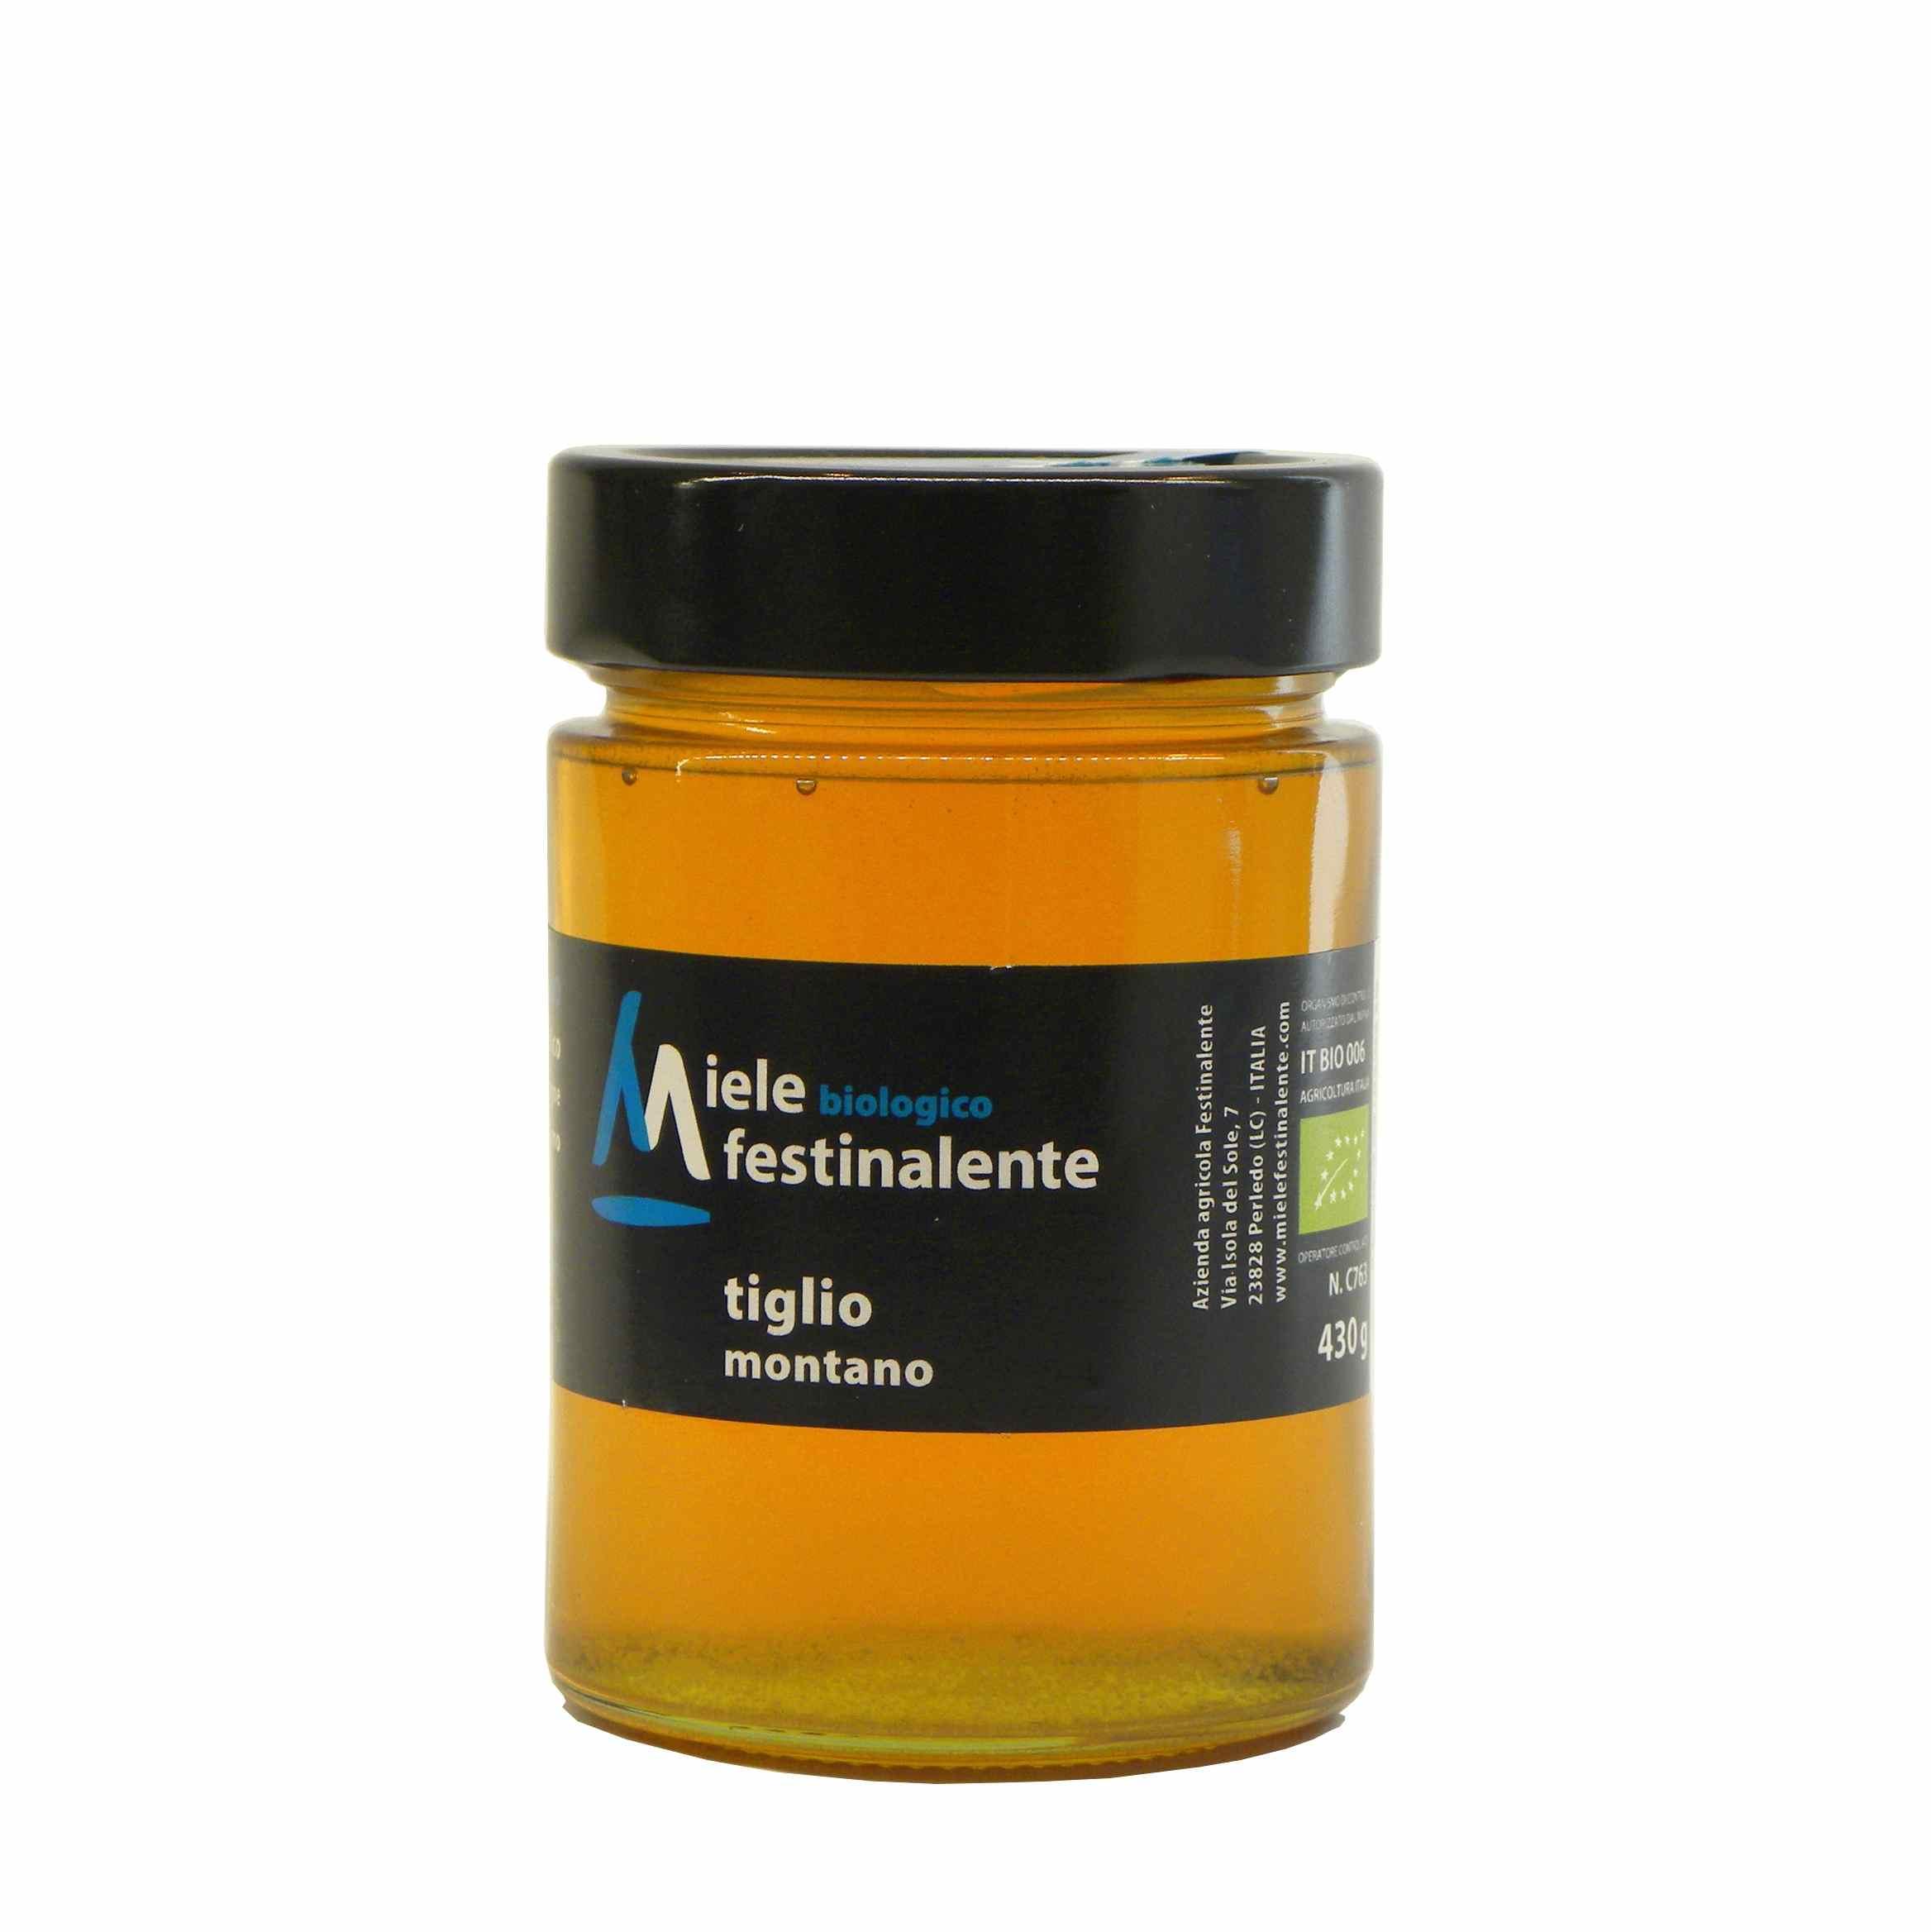 Festinalente miele bio tiglio – Festinalente organic raw linden honey – Gustorotondo – Italian food boutique